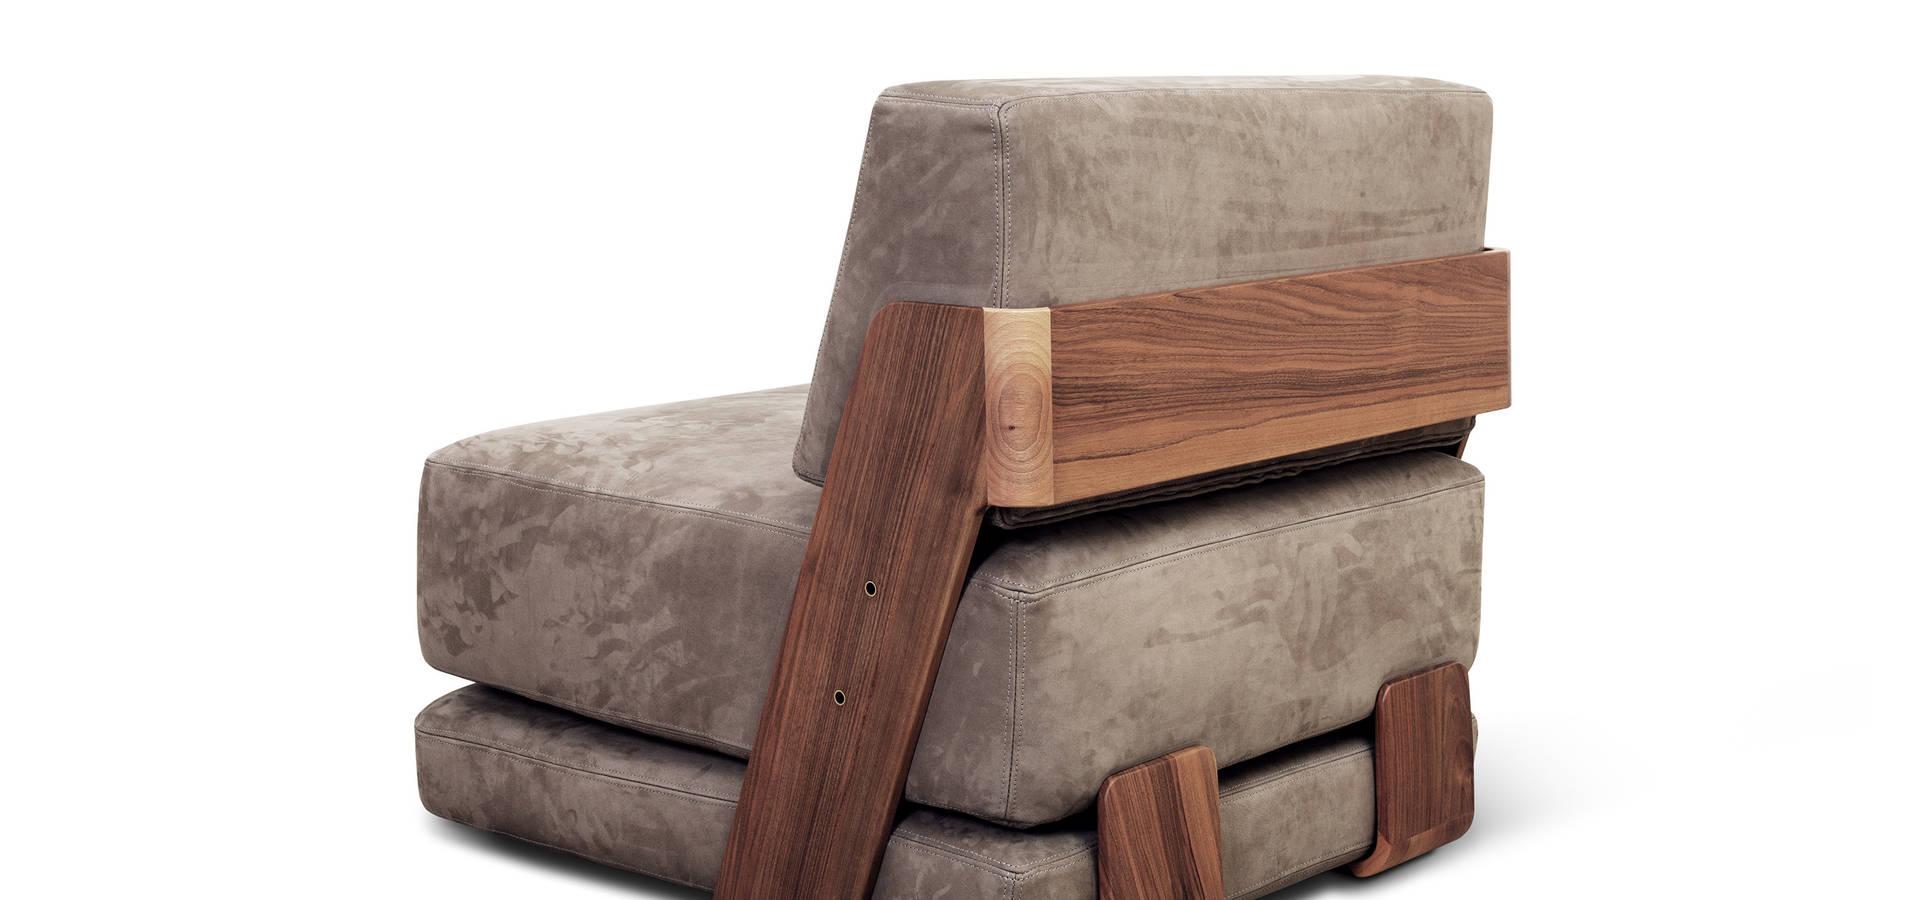 MK Matthias Krenn Design